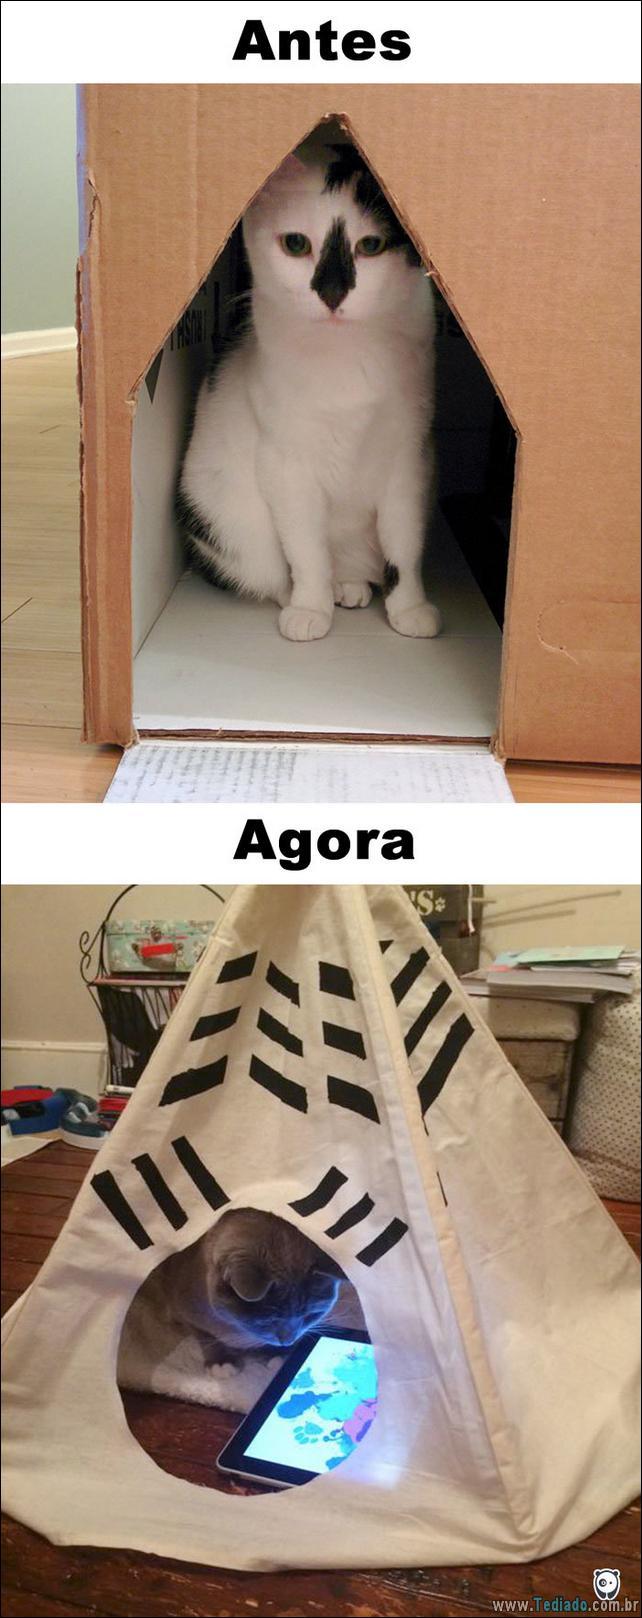 antes-e-agora-como-tecnologia-mudou-a-vida-gatos-11